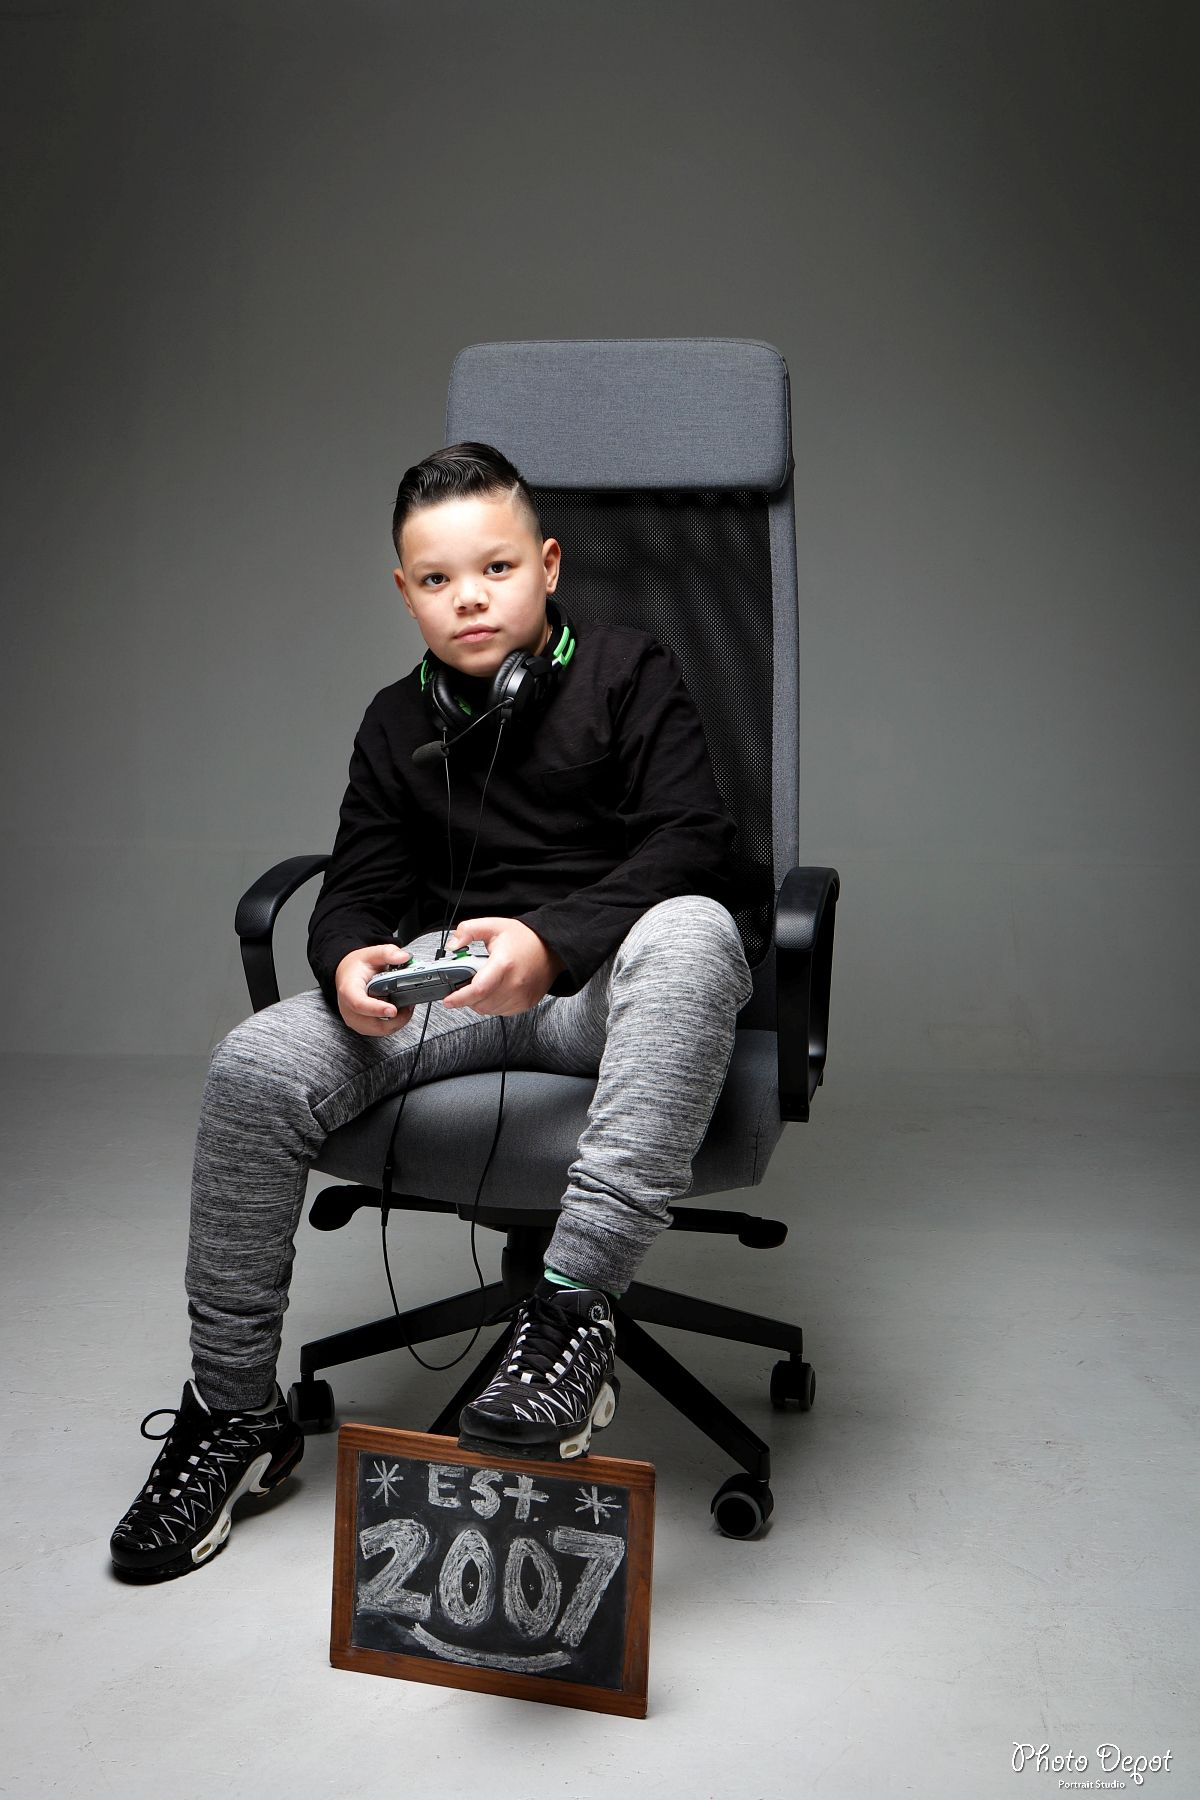 Boys 11 Year Old Picture Idea Est 2007 Gamer Boy Boy Birthday Pictures Senior Boy Photography Birthday Photoshoot Ideas Boys